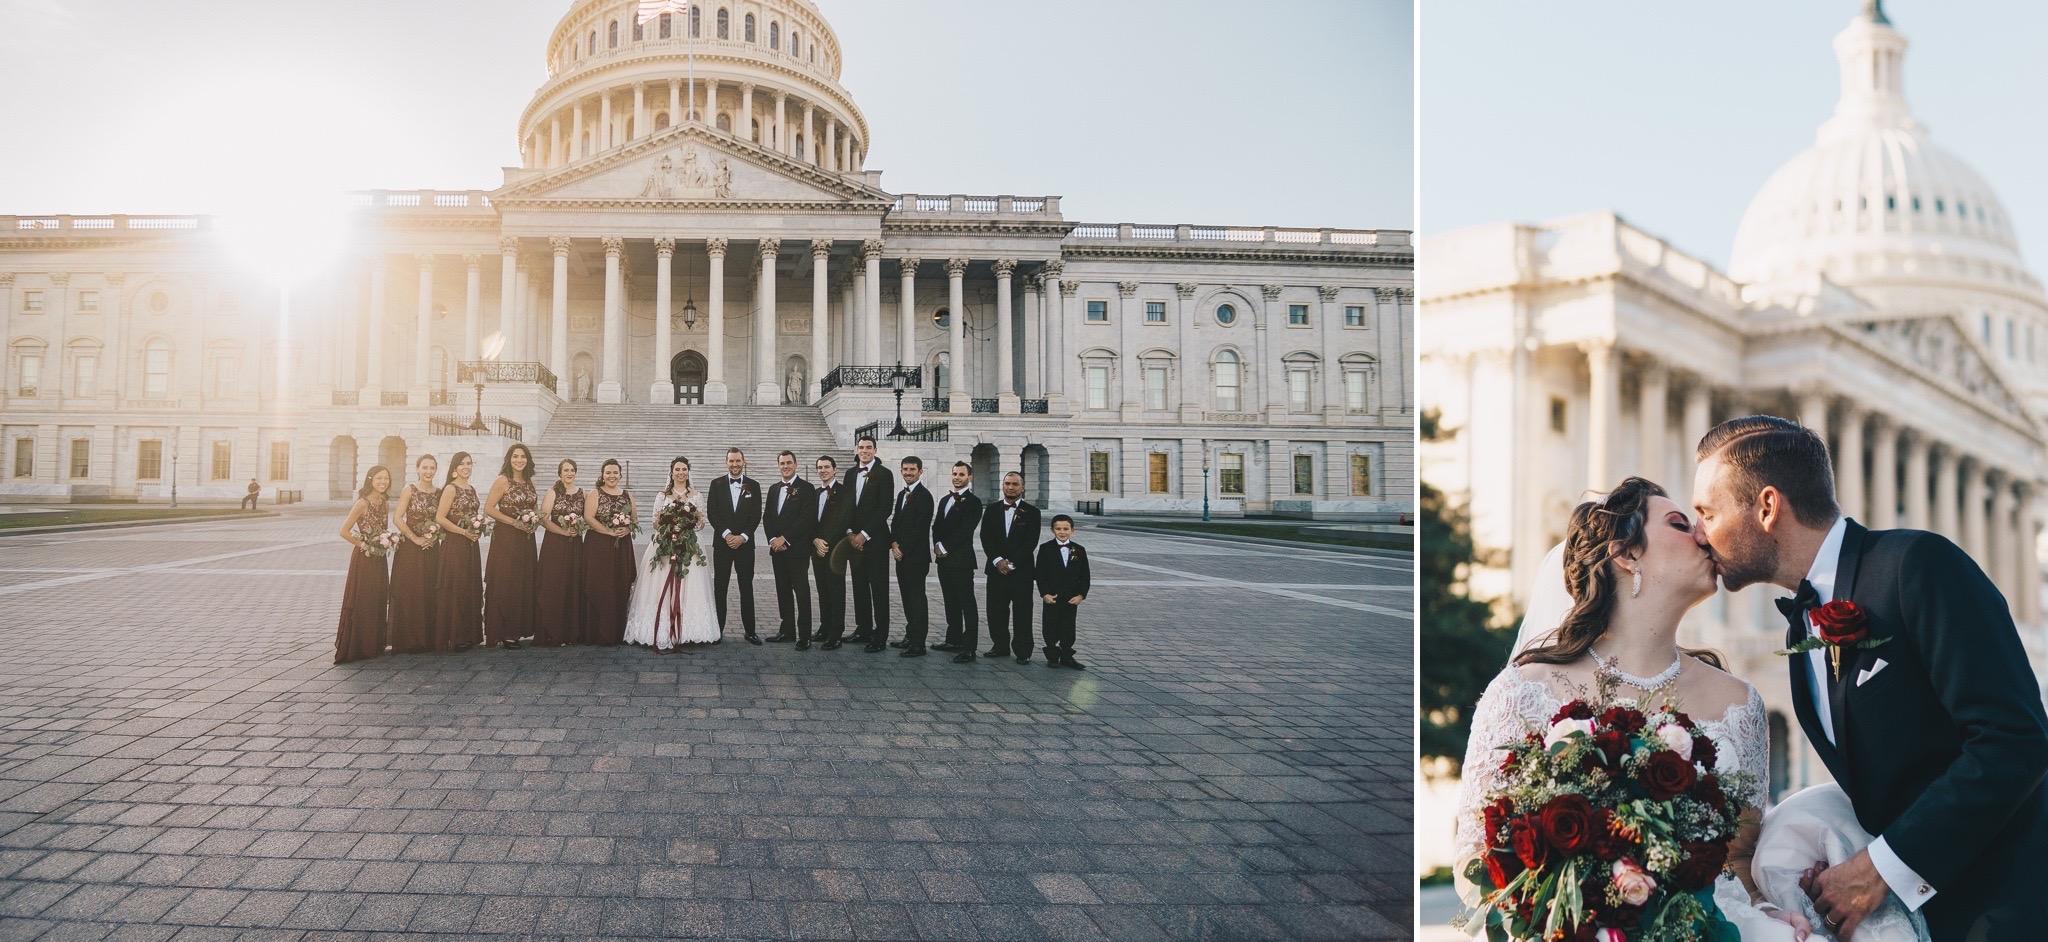 Nathan Elaina Romantic Capitol Wedding in Washington DC by Jonathan Hannah Photography8.jpg